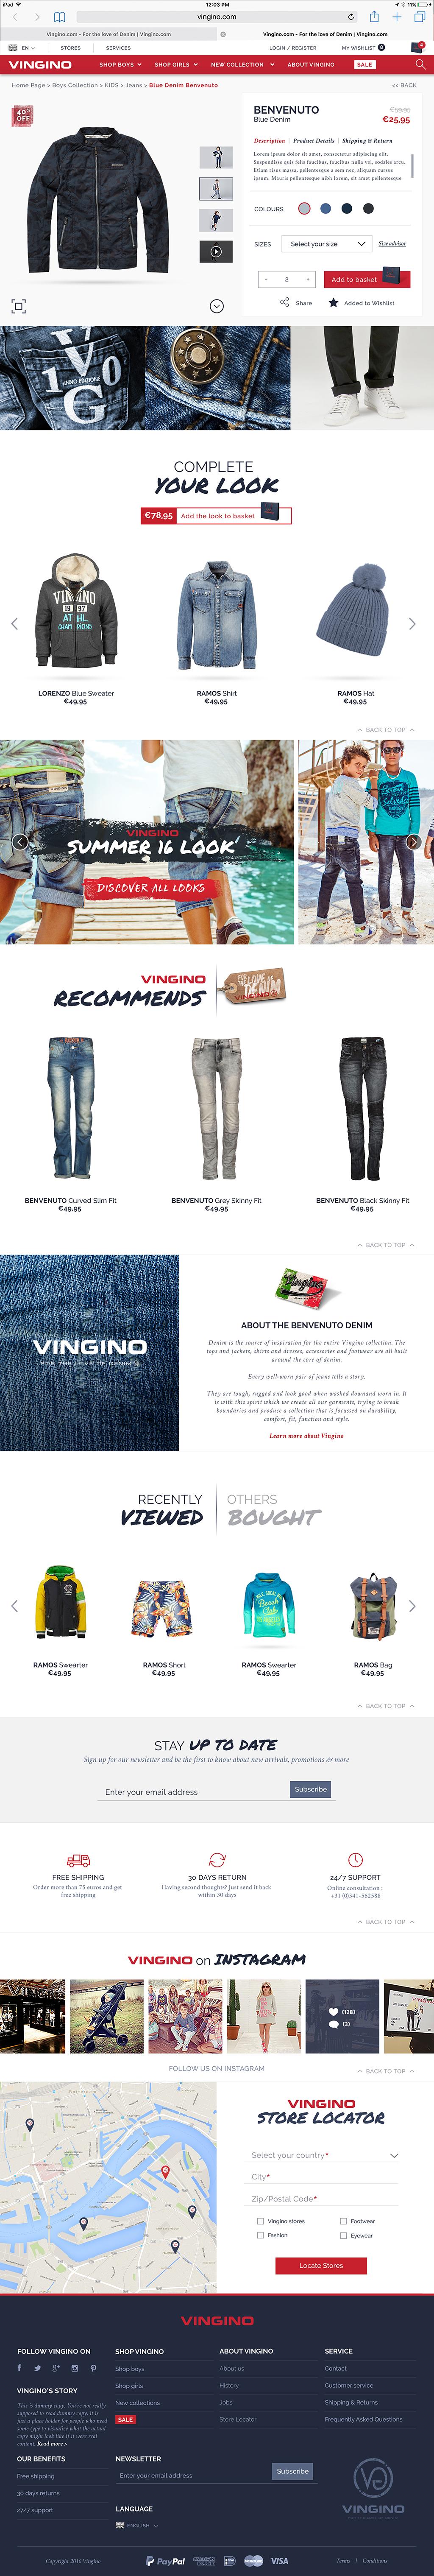 04-01-Product-Page---Boys---Vingino---Tablet_@1x.jpg